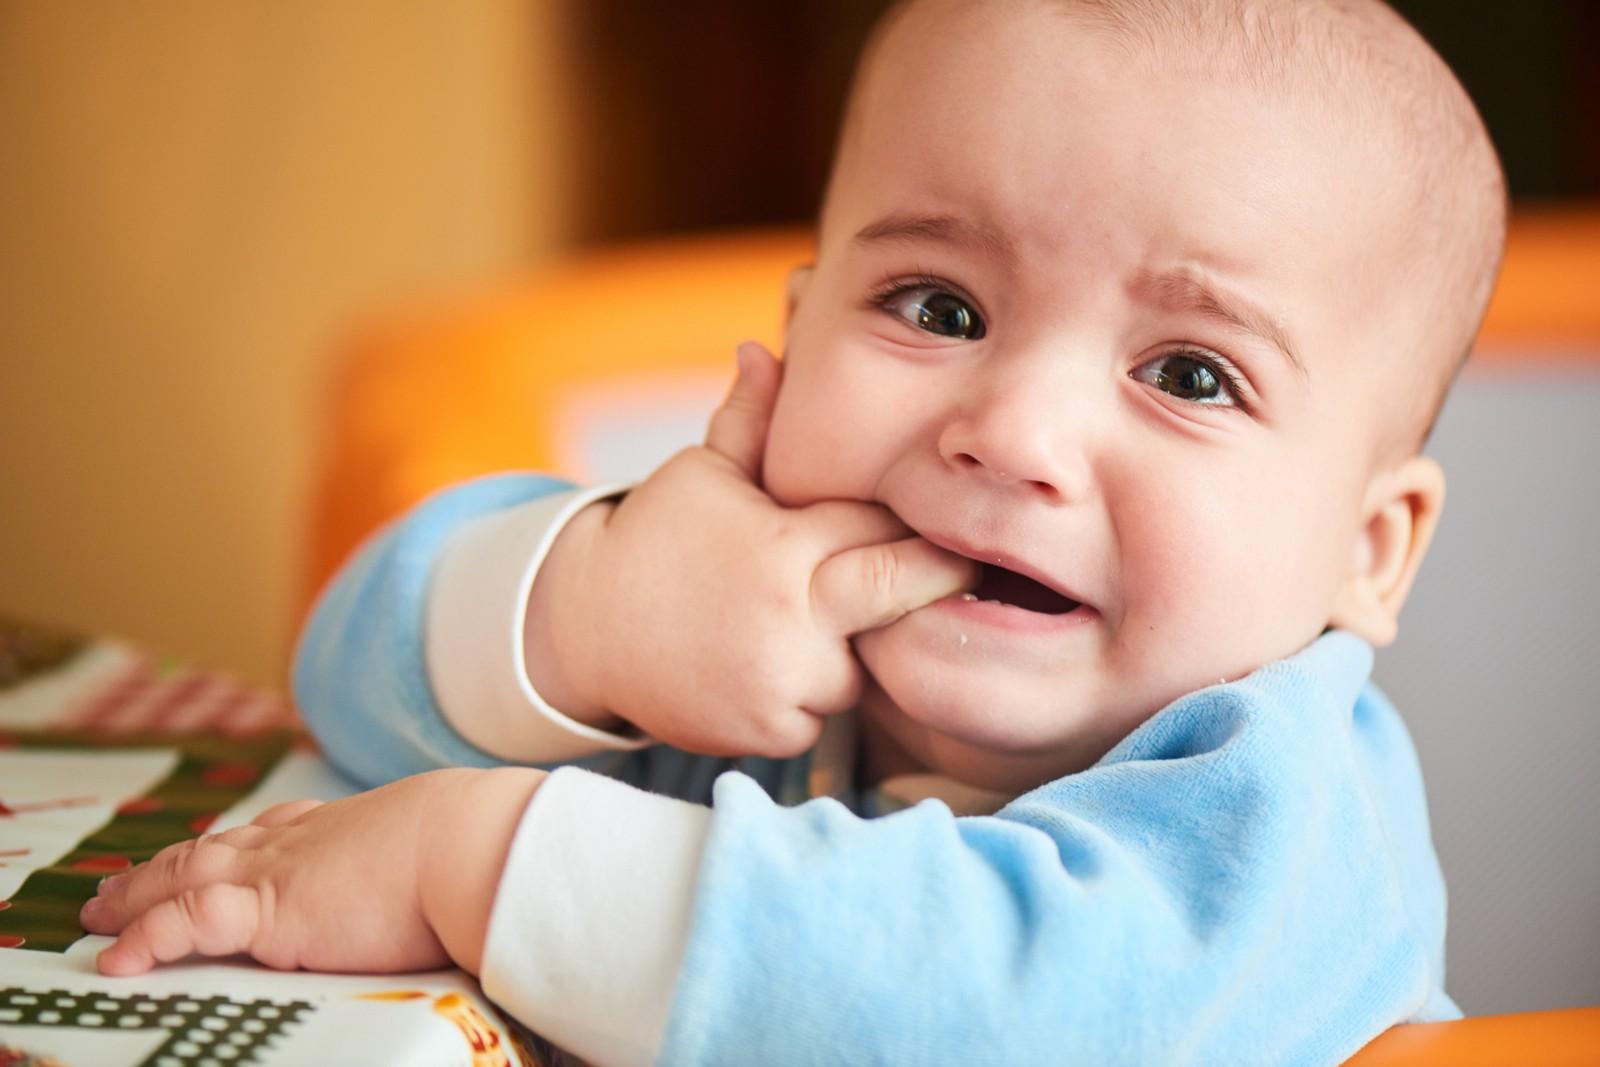 Does Teething Impact My Baby's Sleep?